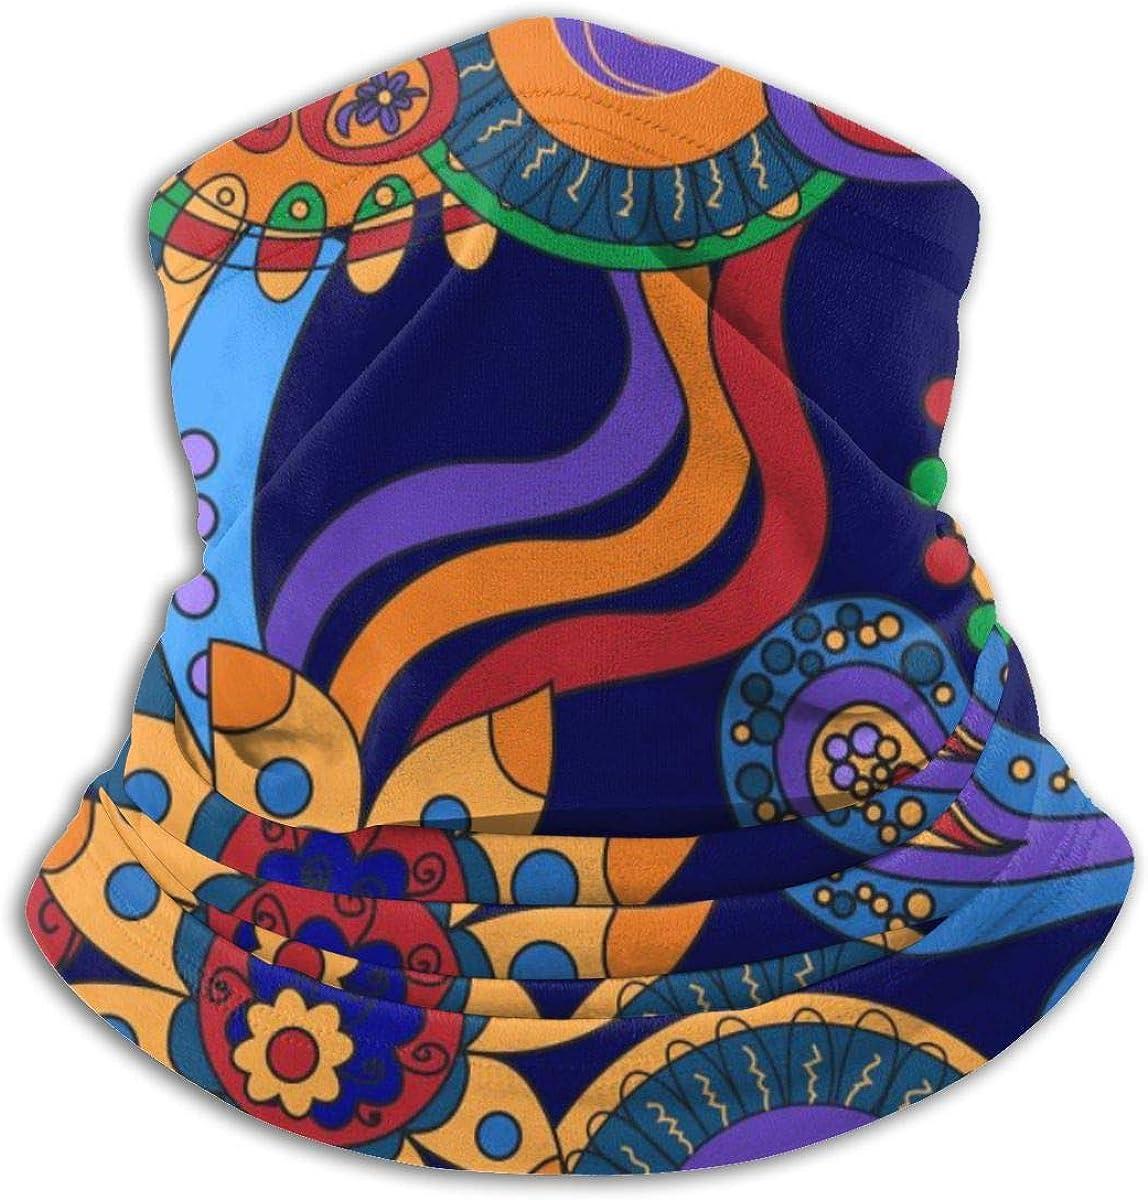 SLHFPX Neck Gaiter Face Mask Oriental Watercolor Pattern Half Balaclava Ski Masks for Women Men Adult